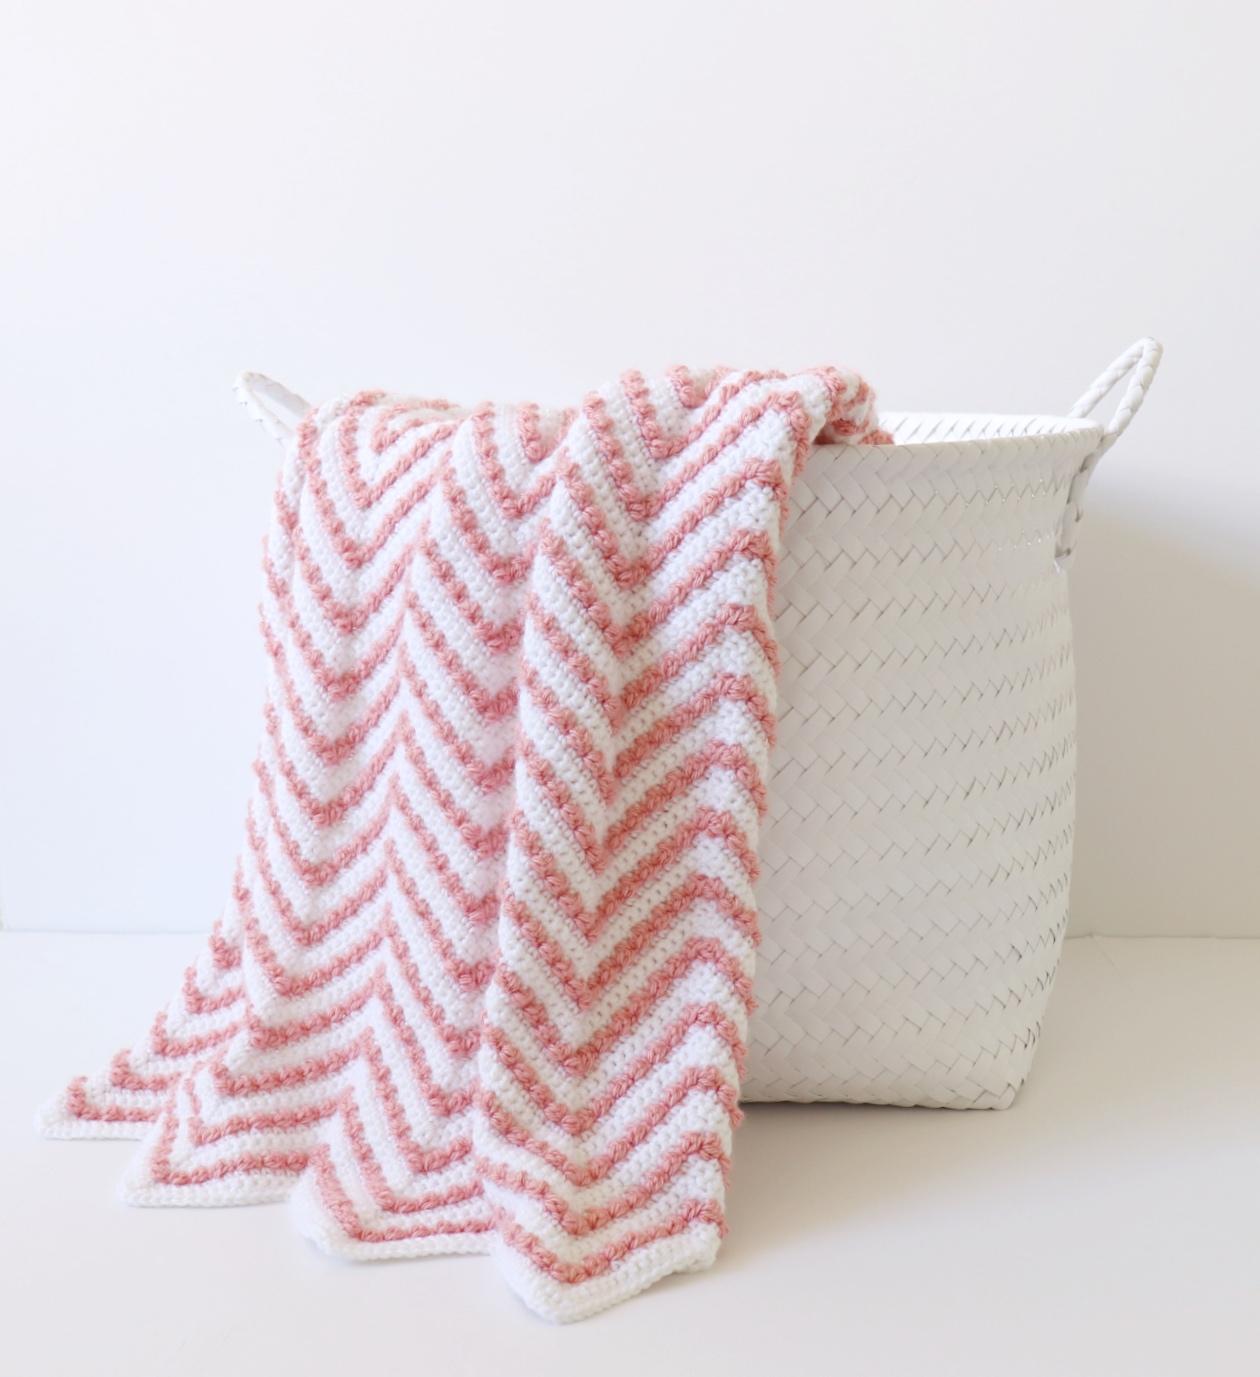 e9d26f673b1 Crochet Berry Chevron Baby Blanket